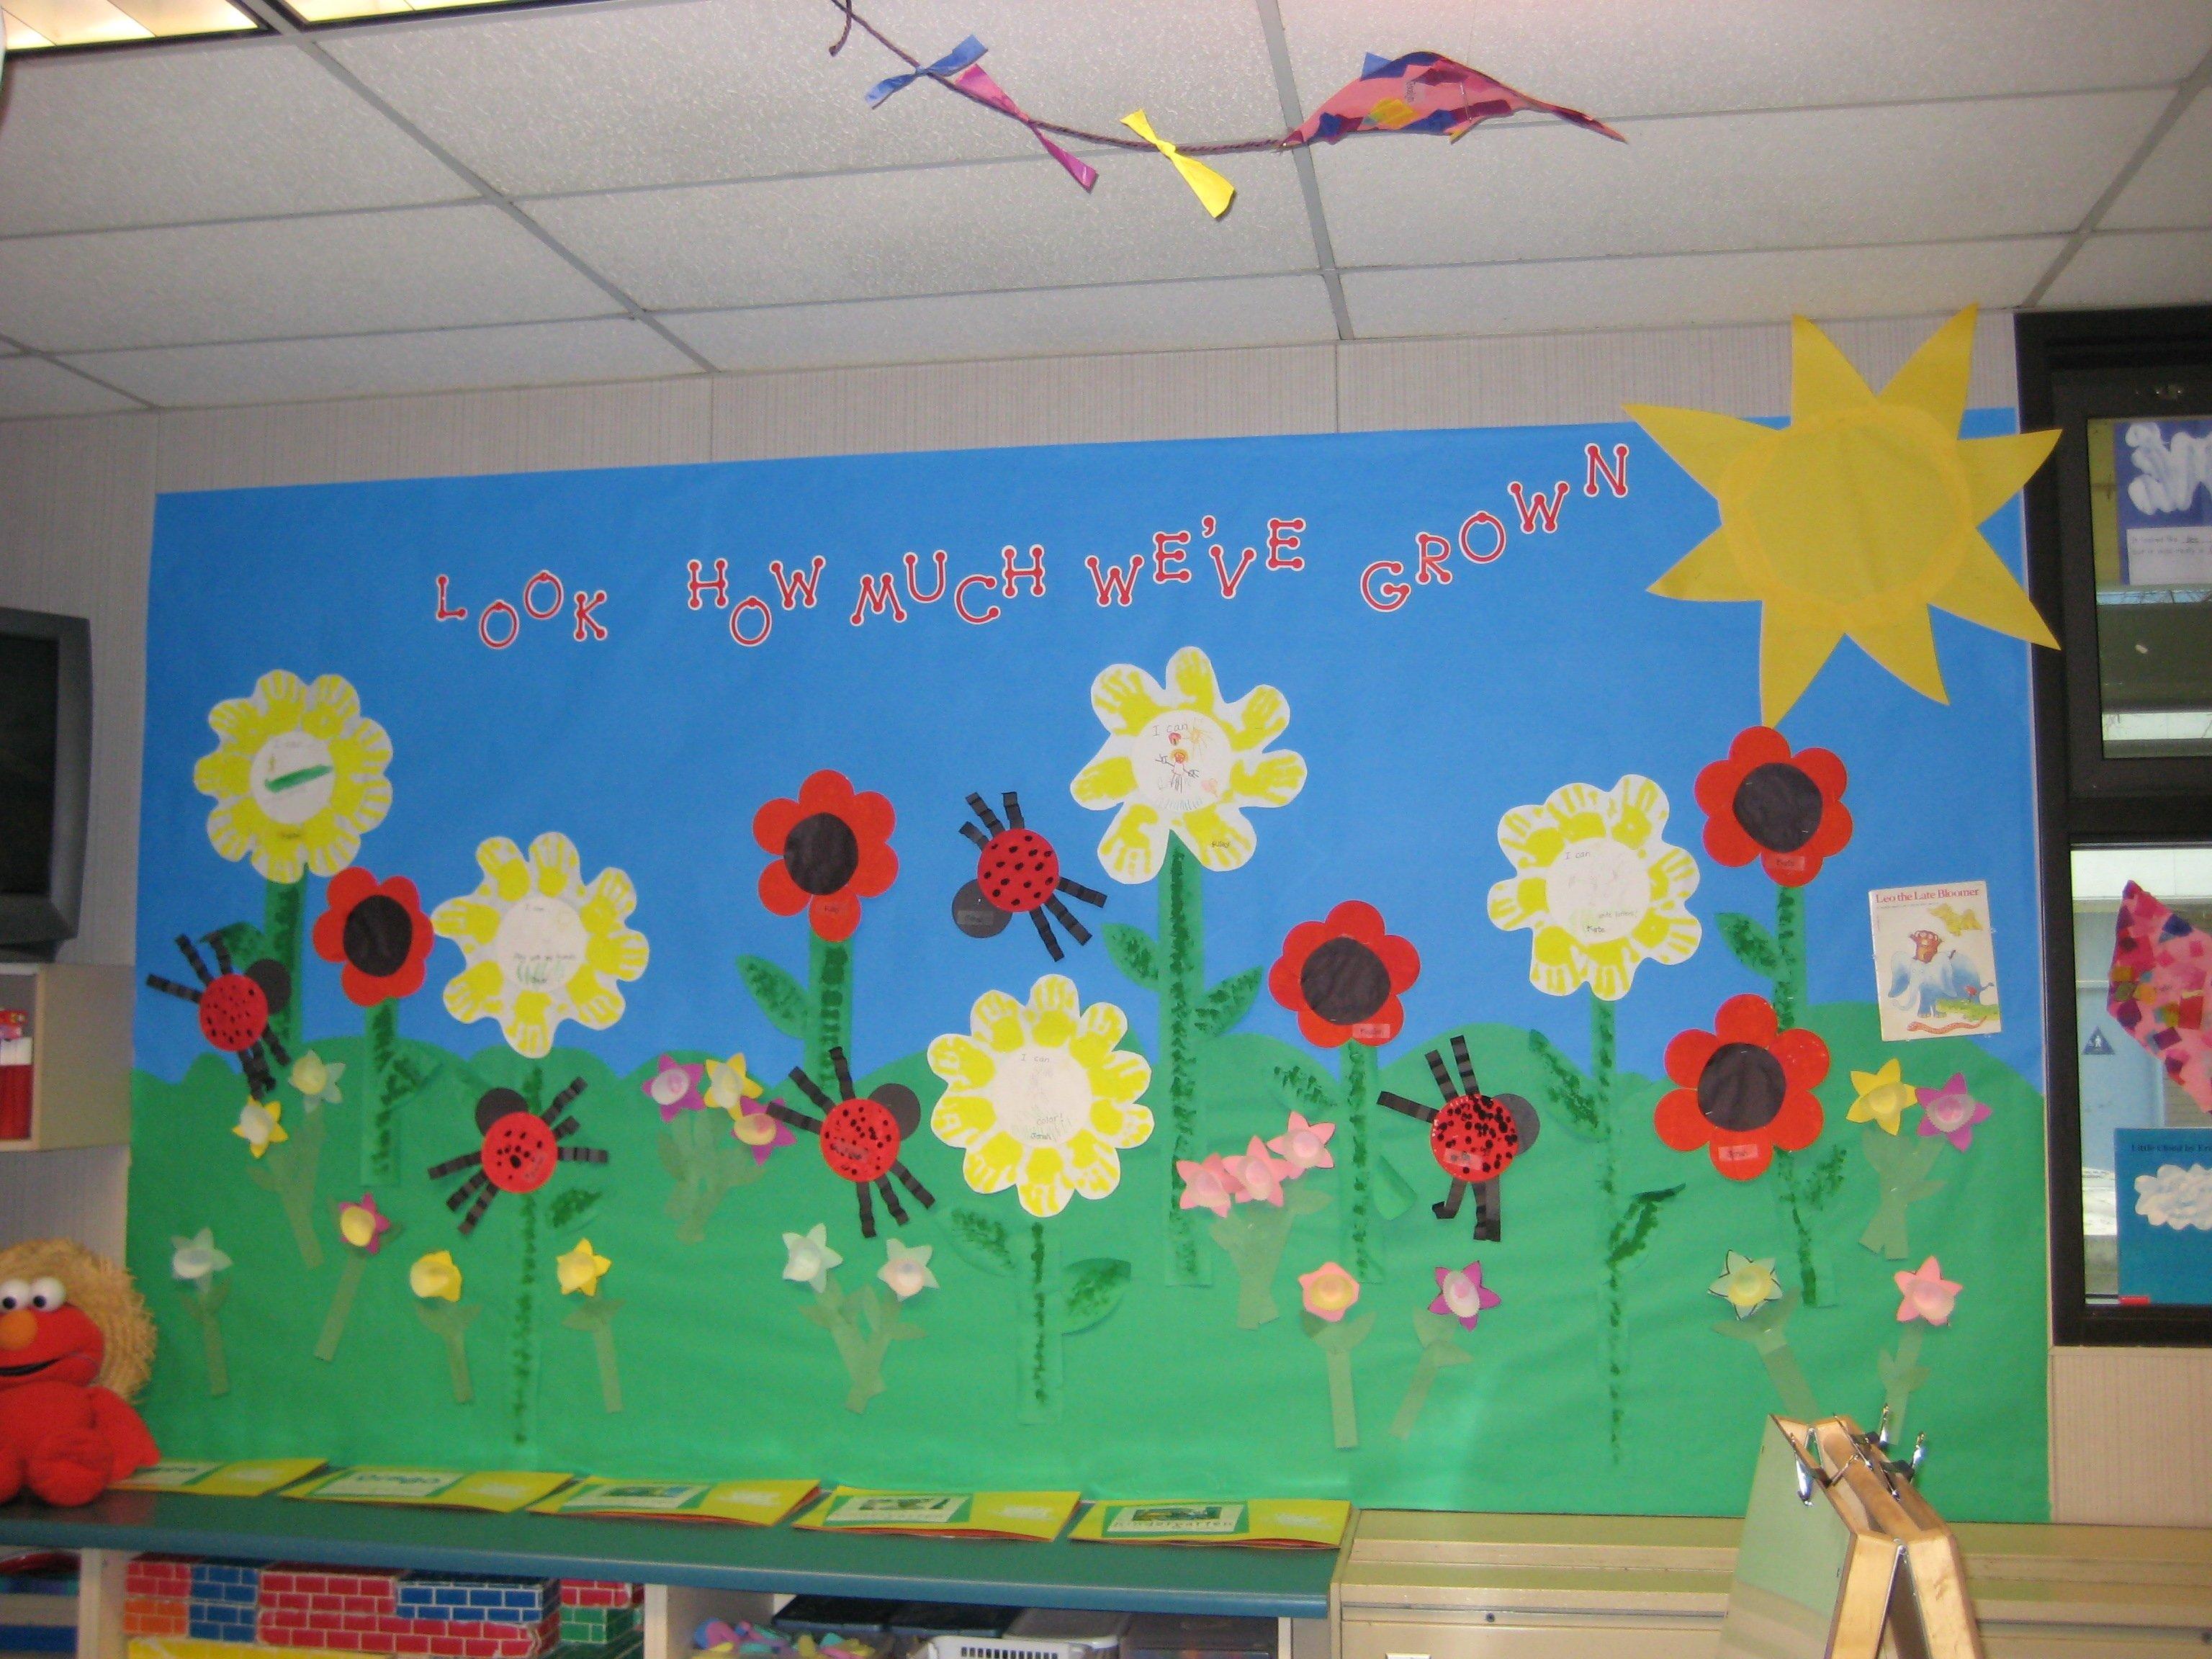 10 Awesome March Preschool Bulletin Board Ideas images about bulletin board ideas on pinterest boards winter and 2020